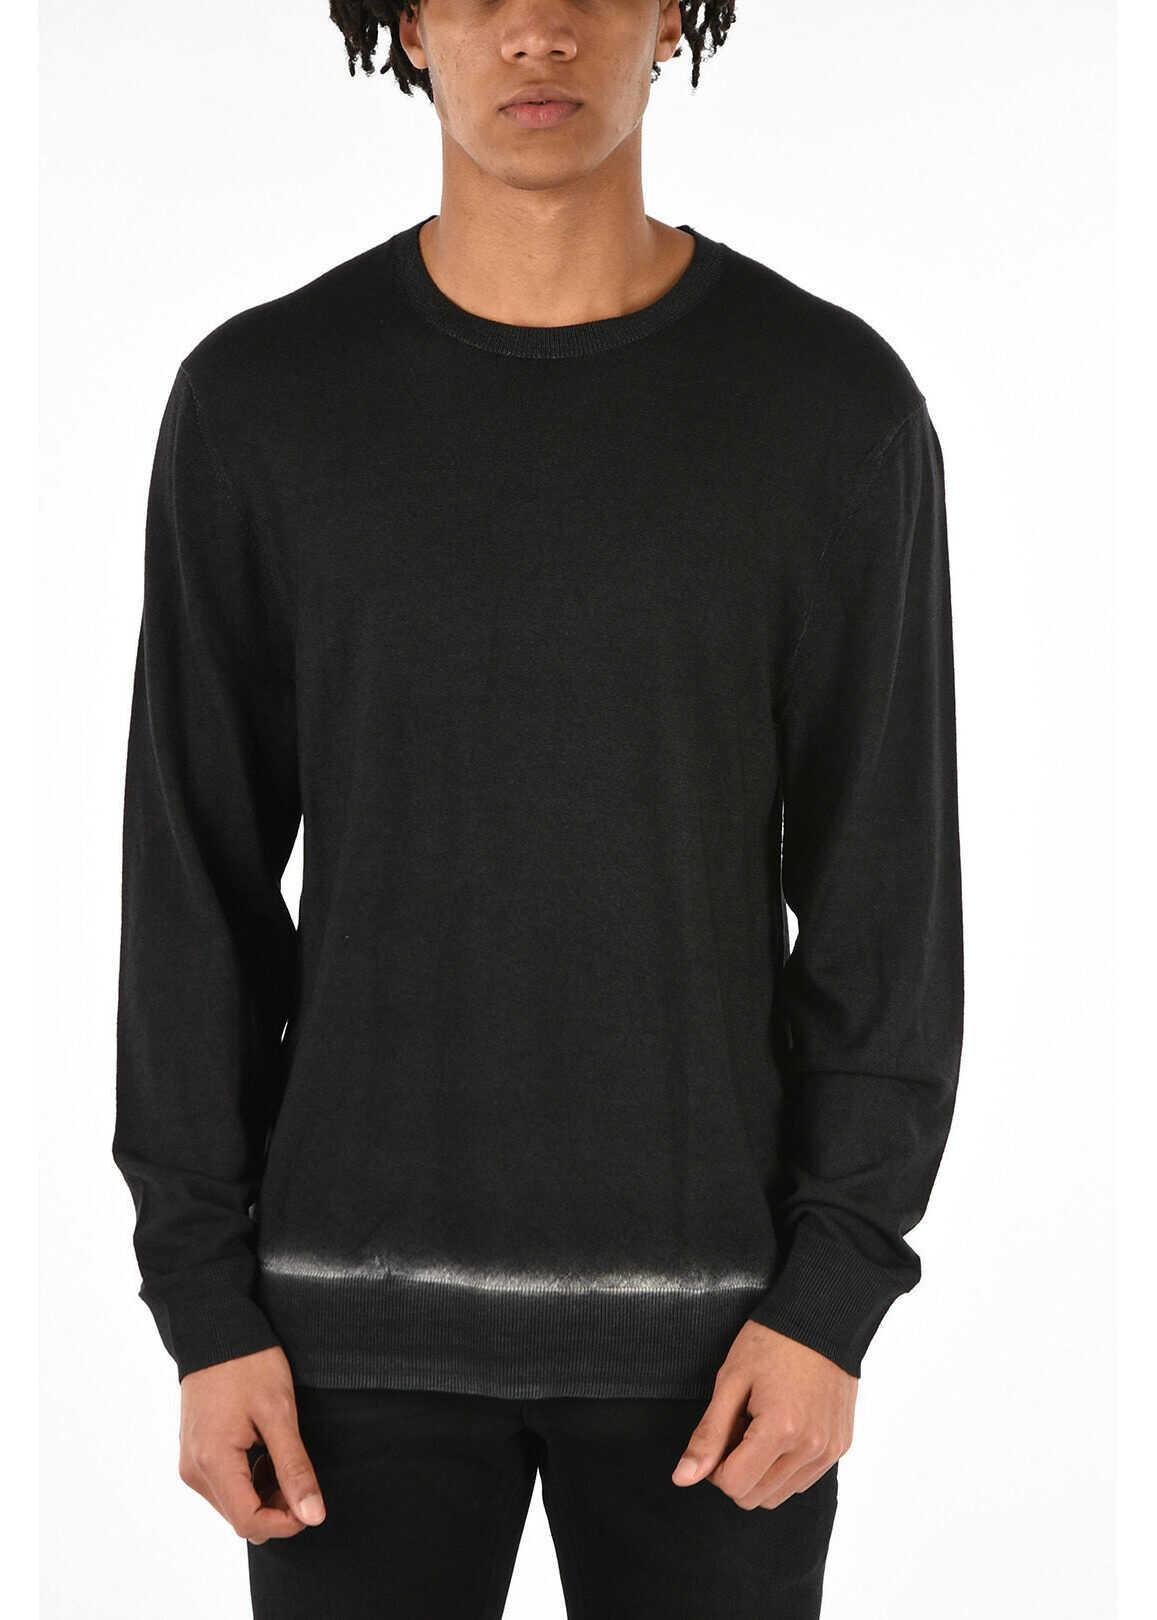 Neil Barrett Bleached Crewneck Sweater GRAY